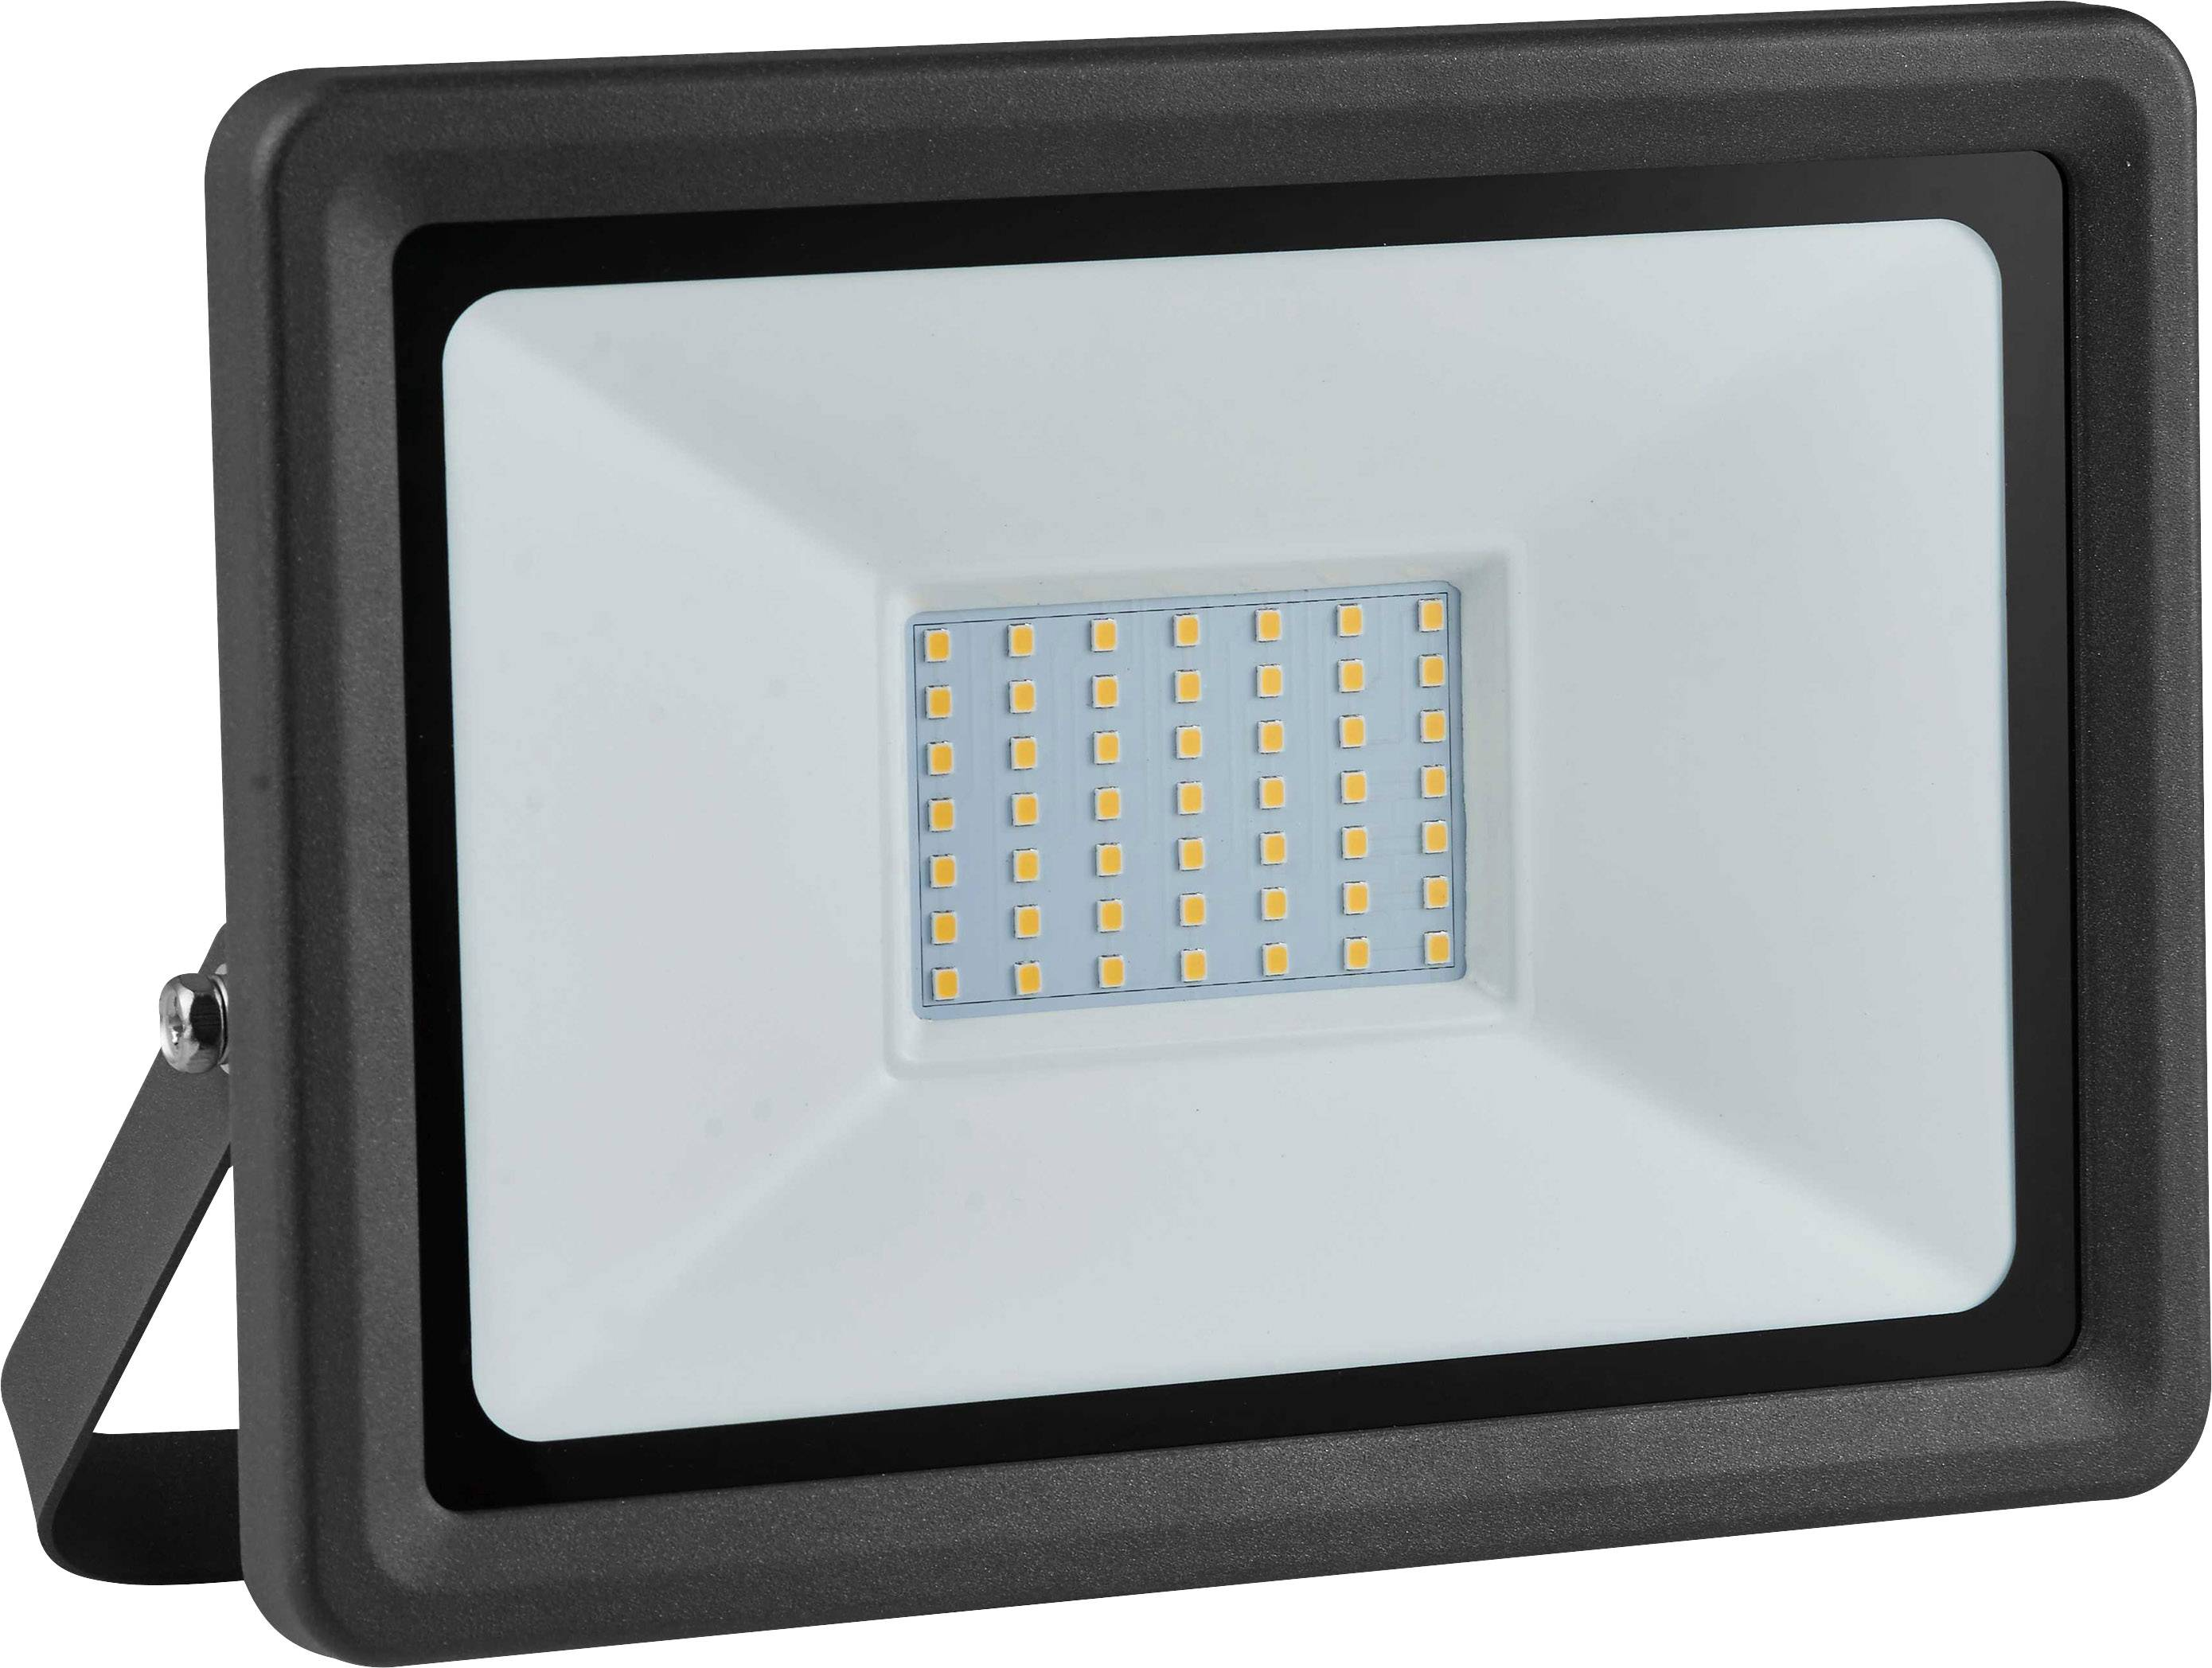 LED Floodlight 50Watt Security Wall Light Outdoor FloodLight Spotlight Cool IP65